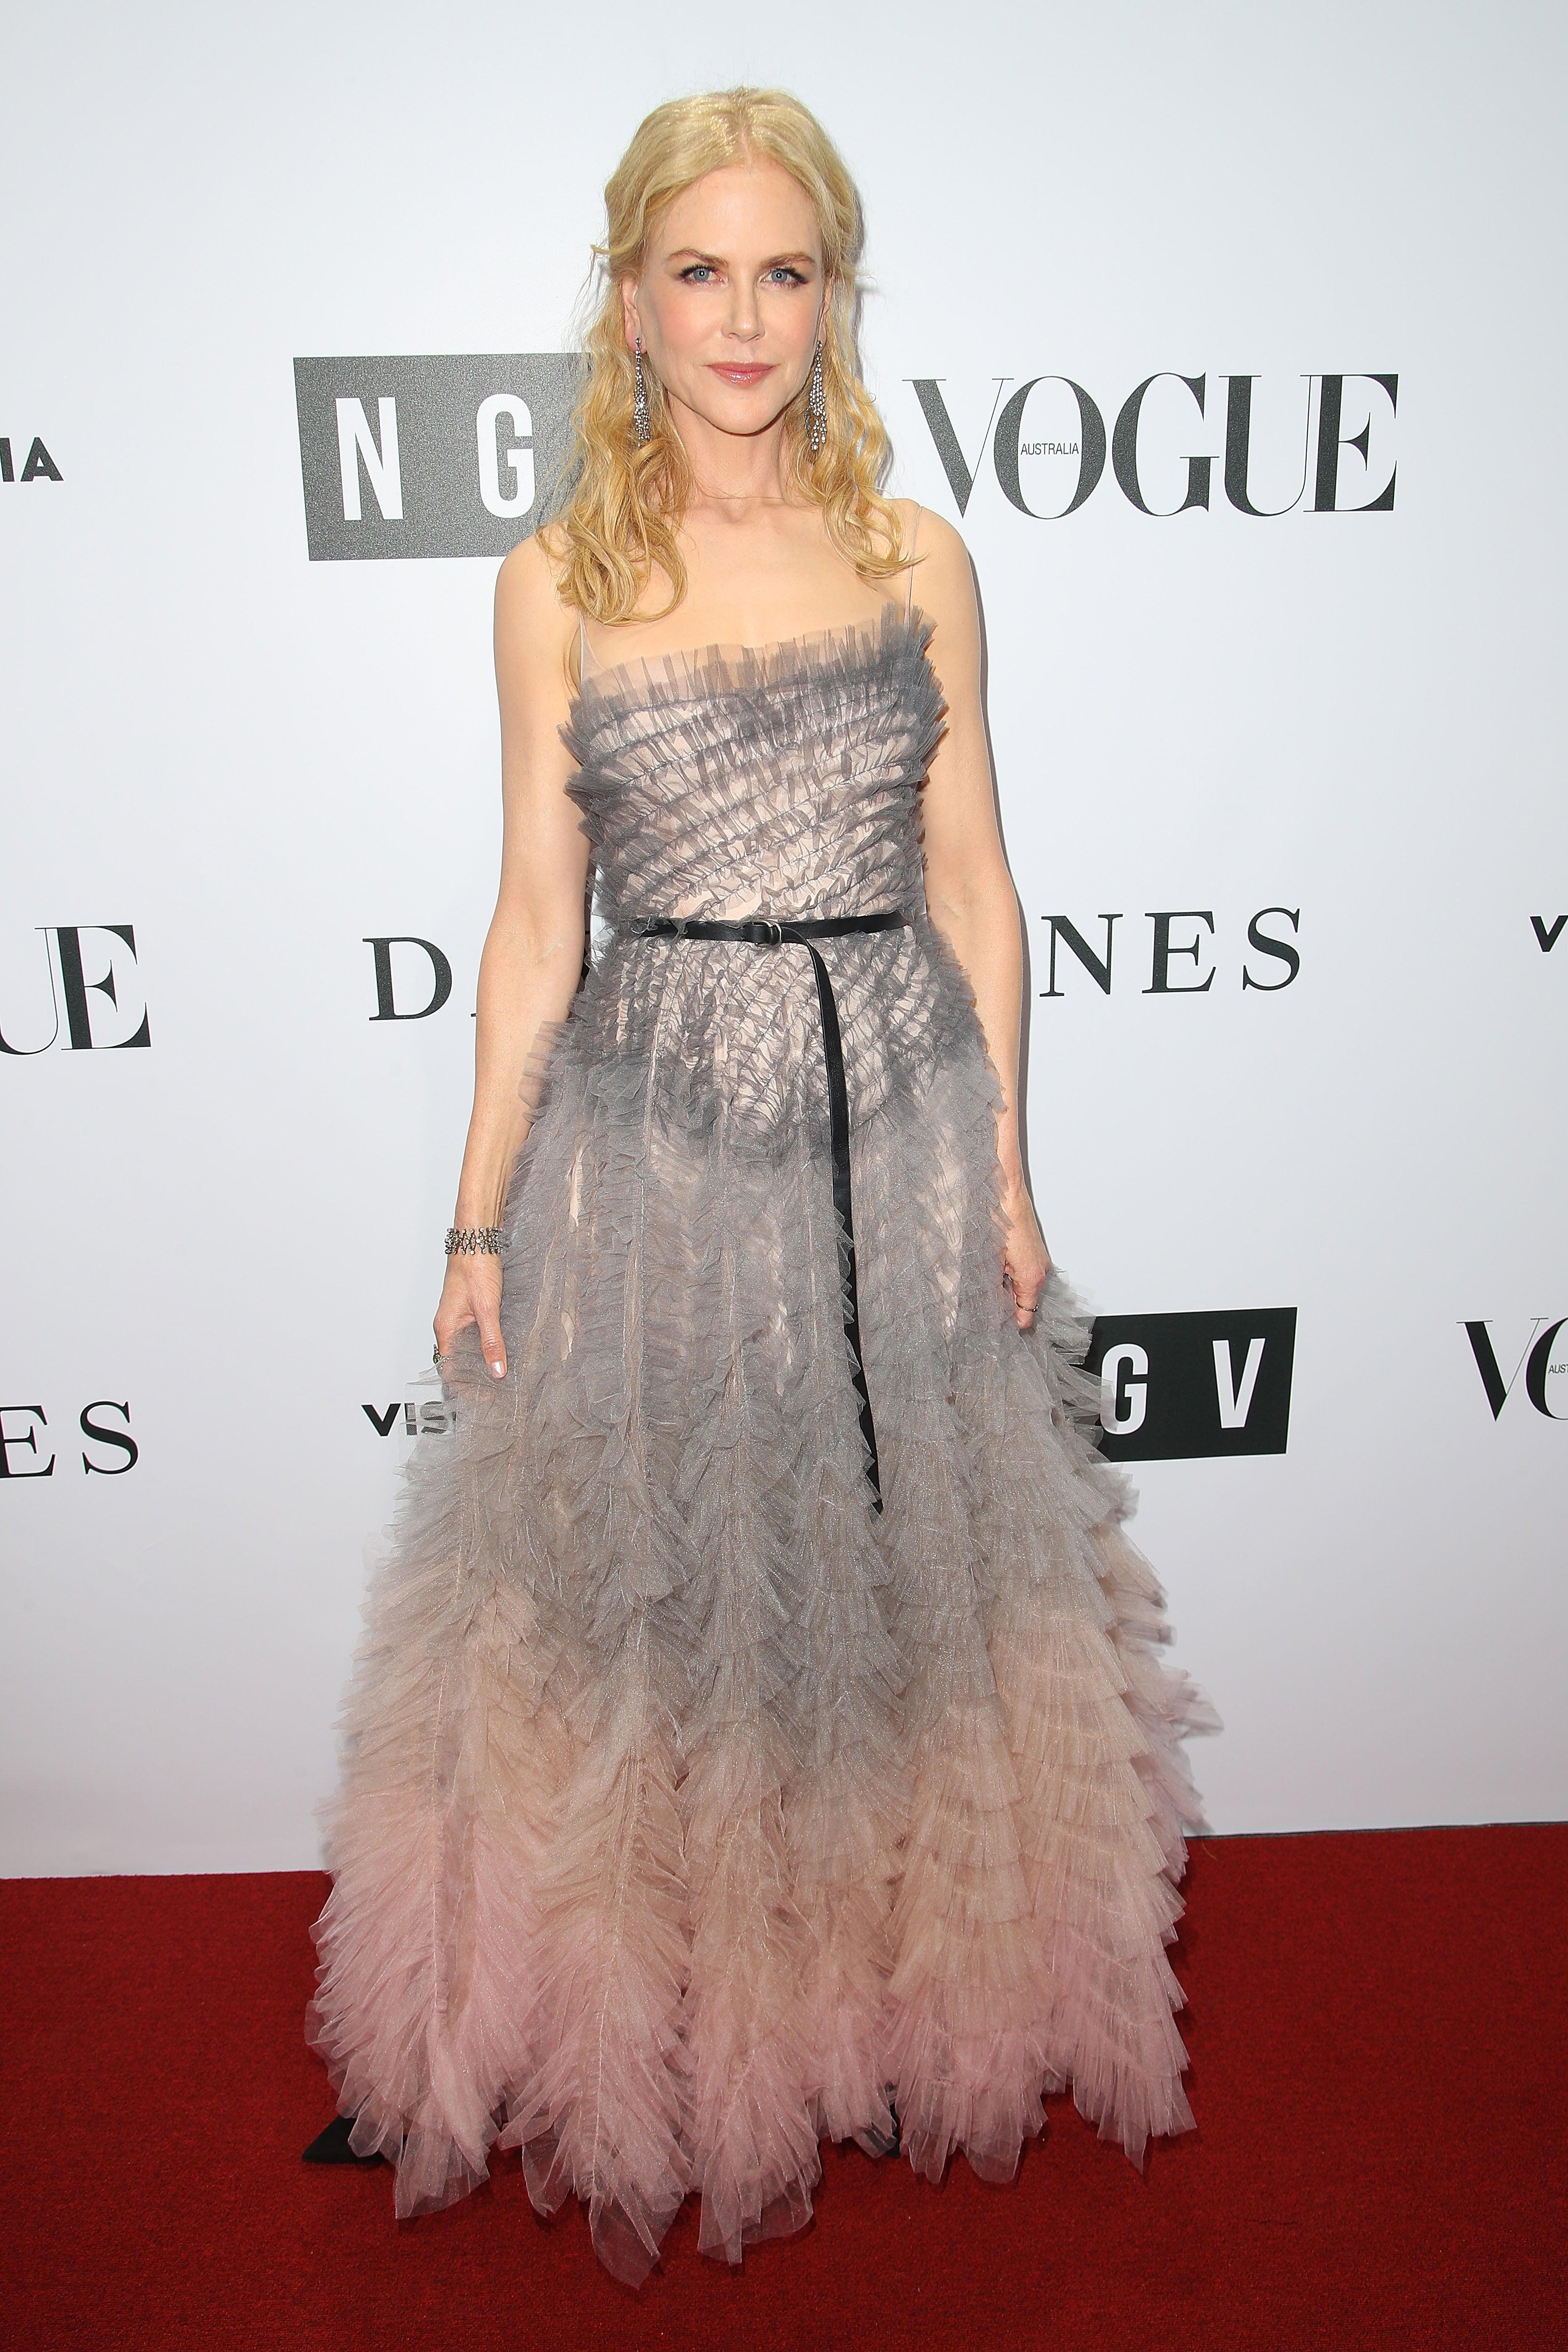 9news Com Nicole Kidman Stuns In Ruffled Gown At Ngv